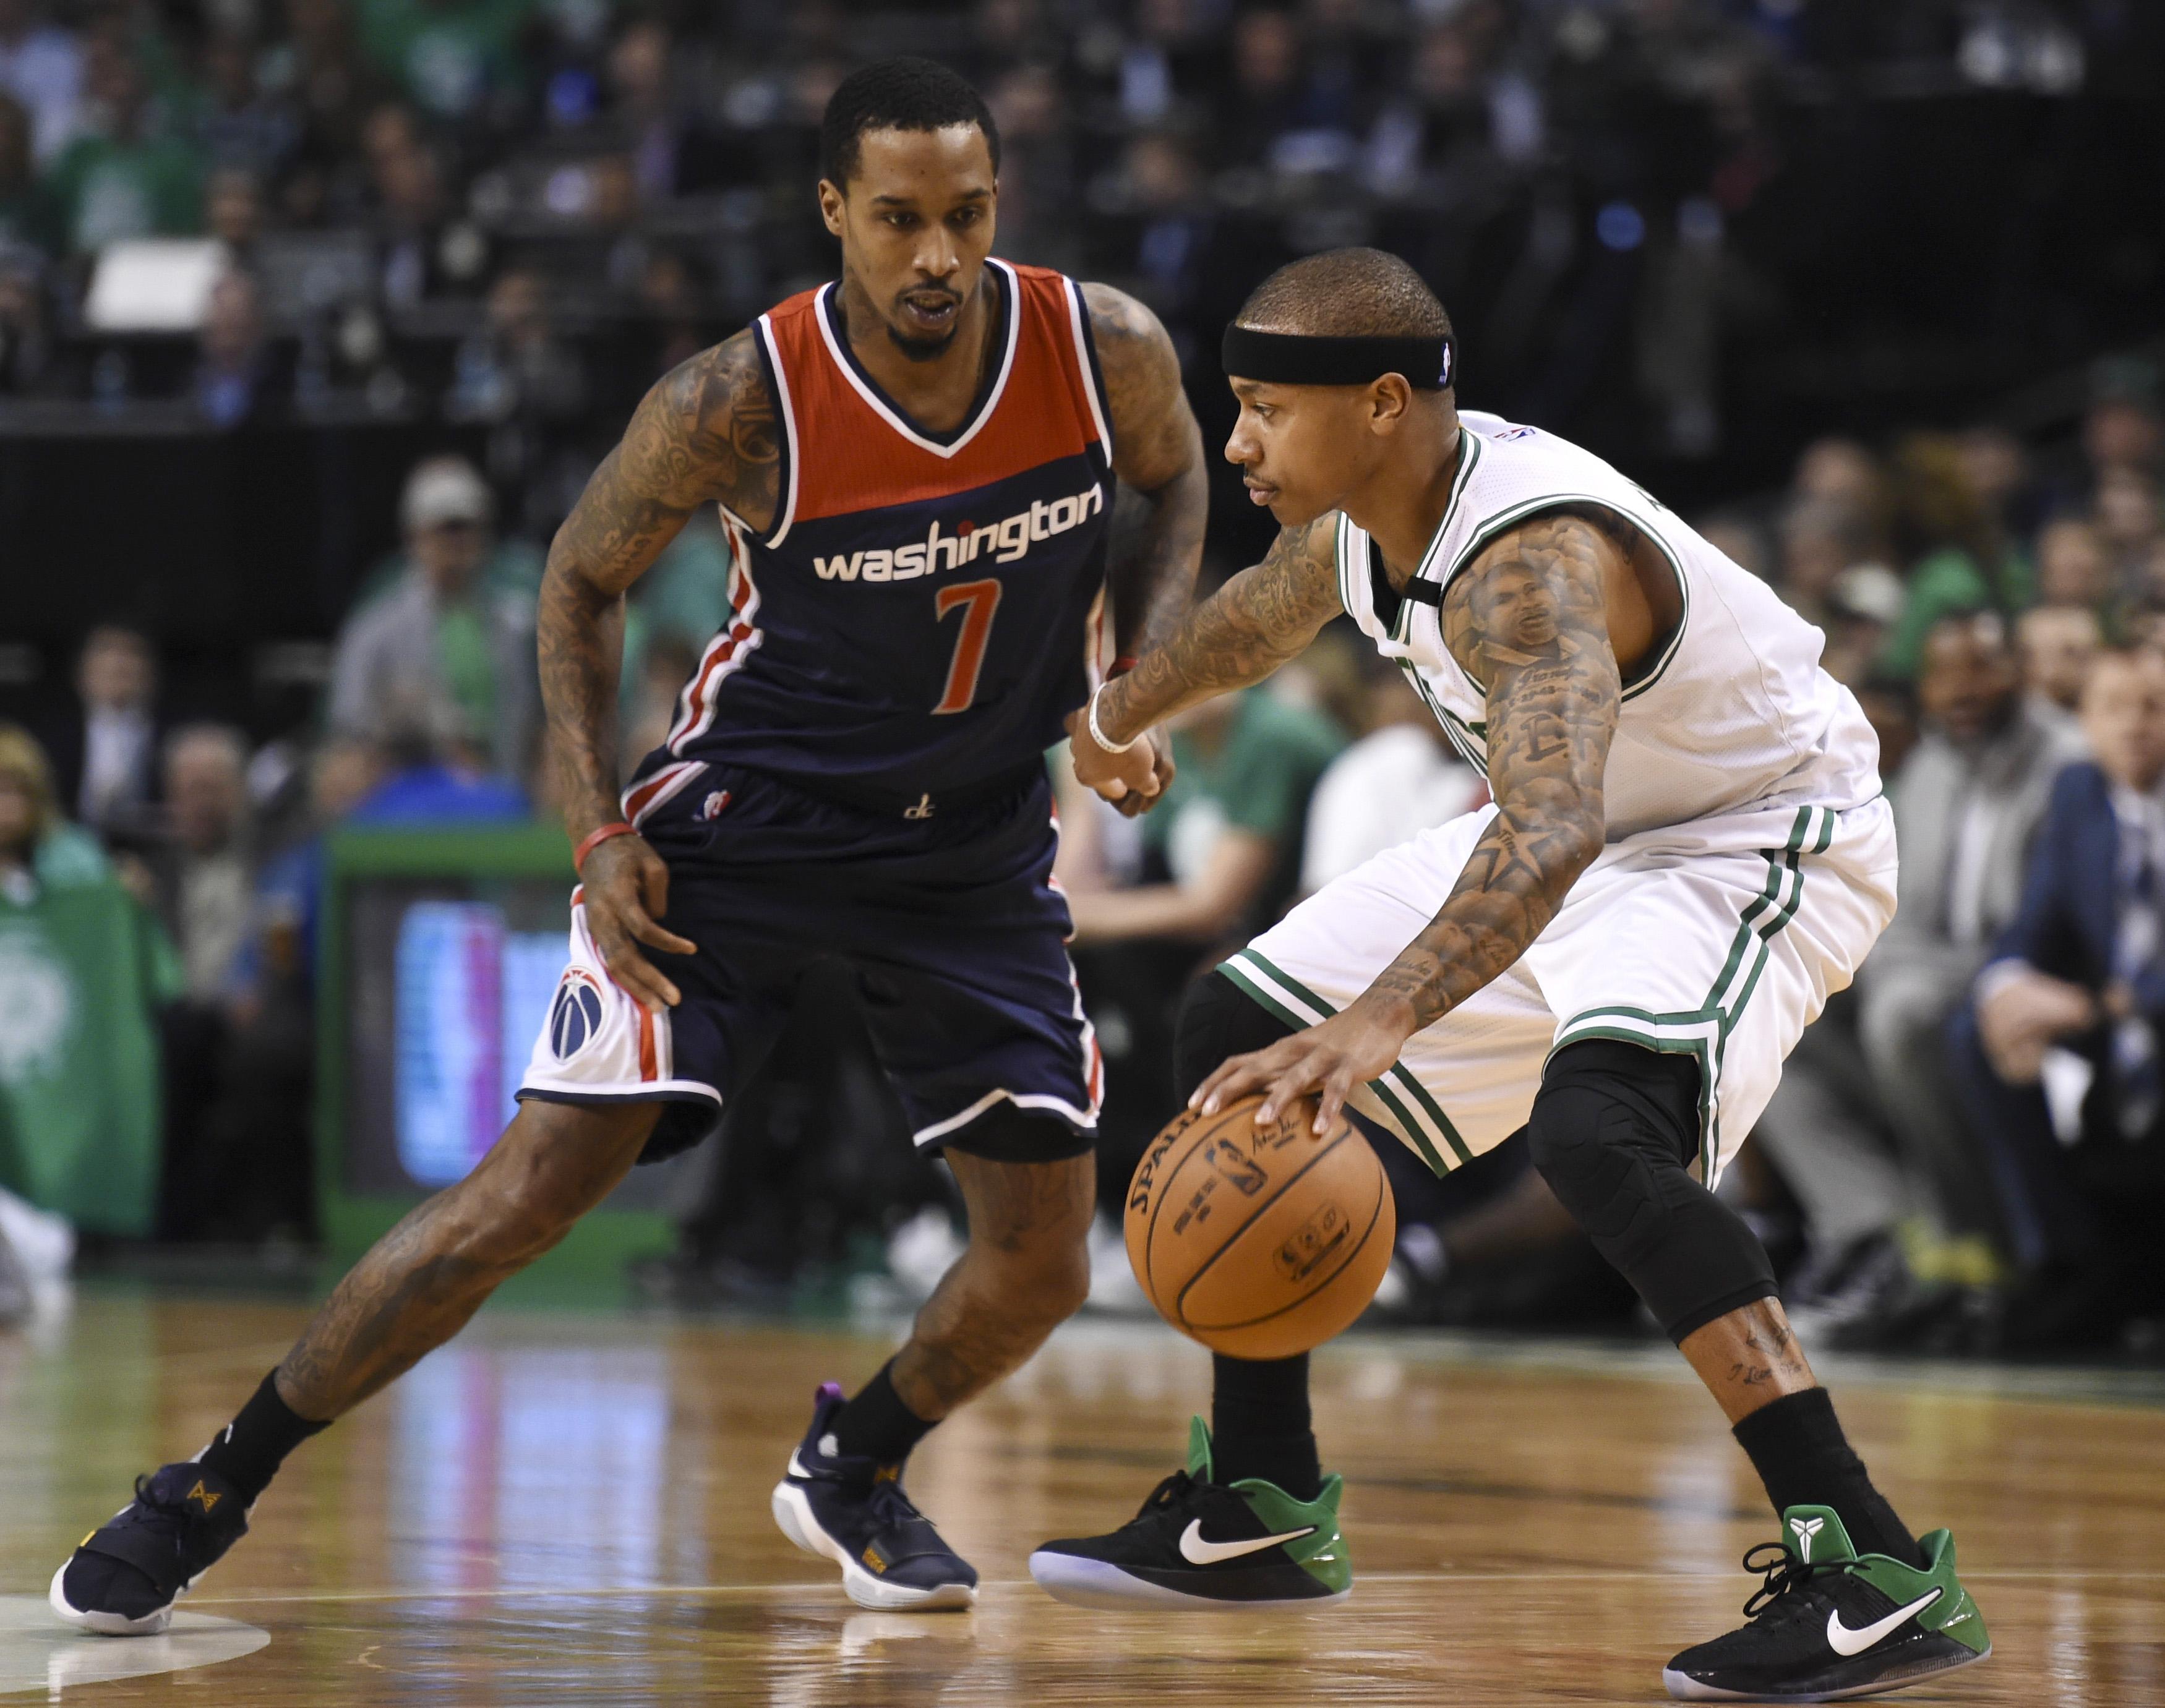 10059454-nba-playoffs-washington-wizards-at-boston-celtics